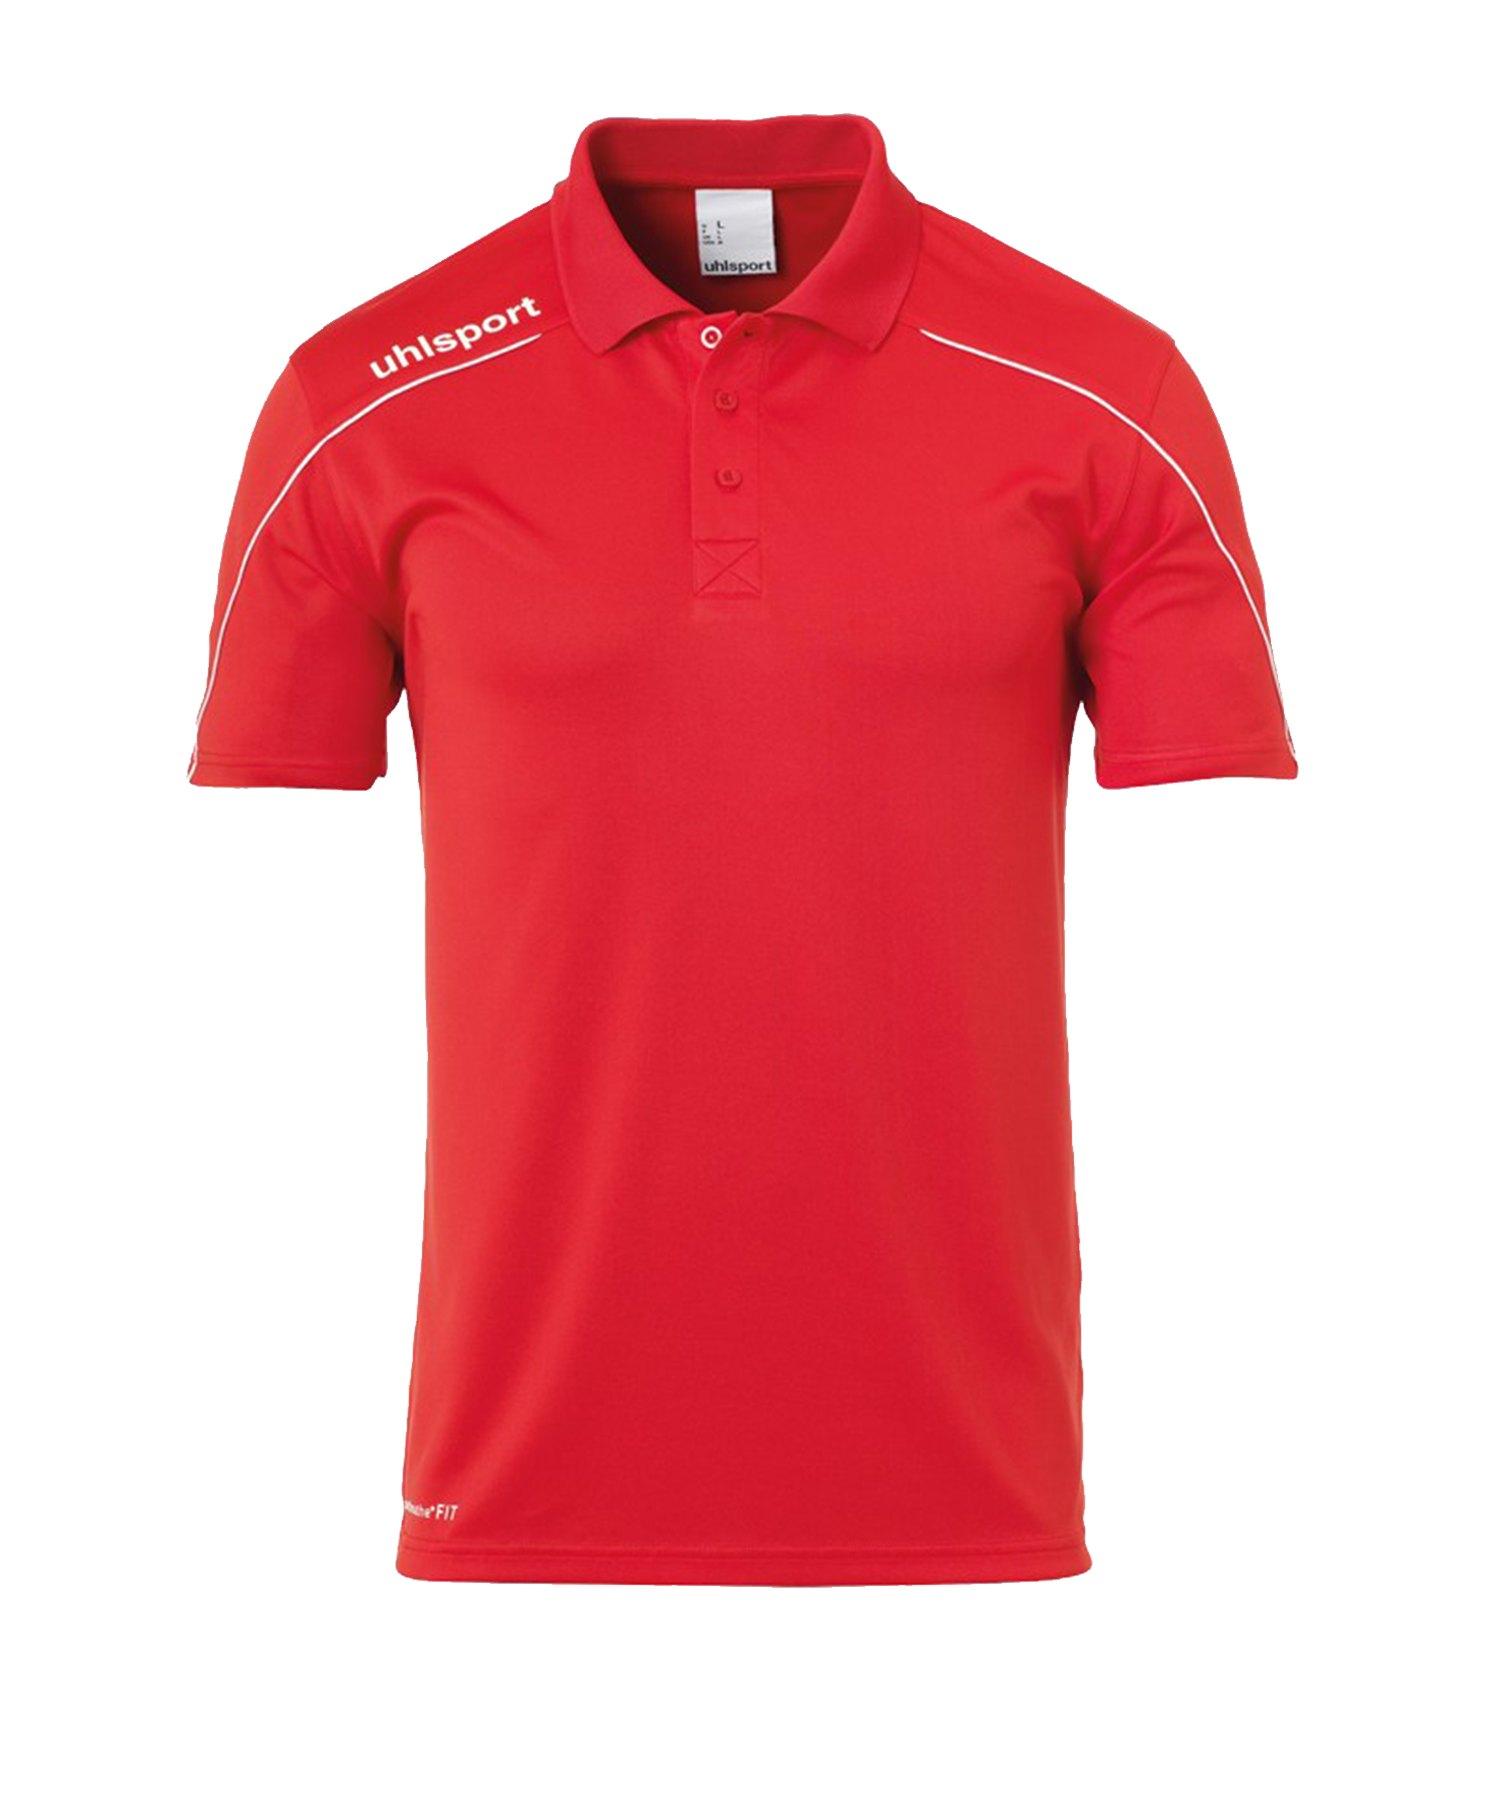 Uhlsport Stream 22 Poloshirt Rot Weiss F04 - Rot